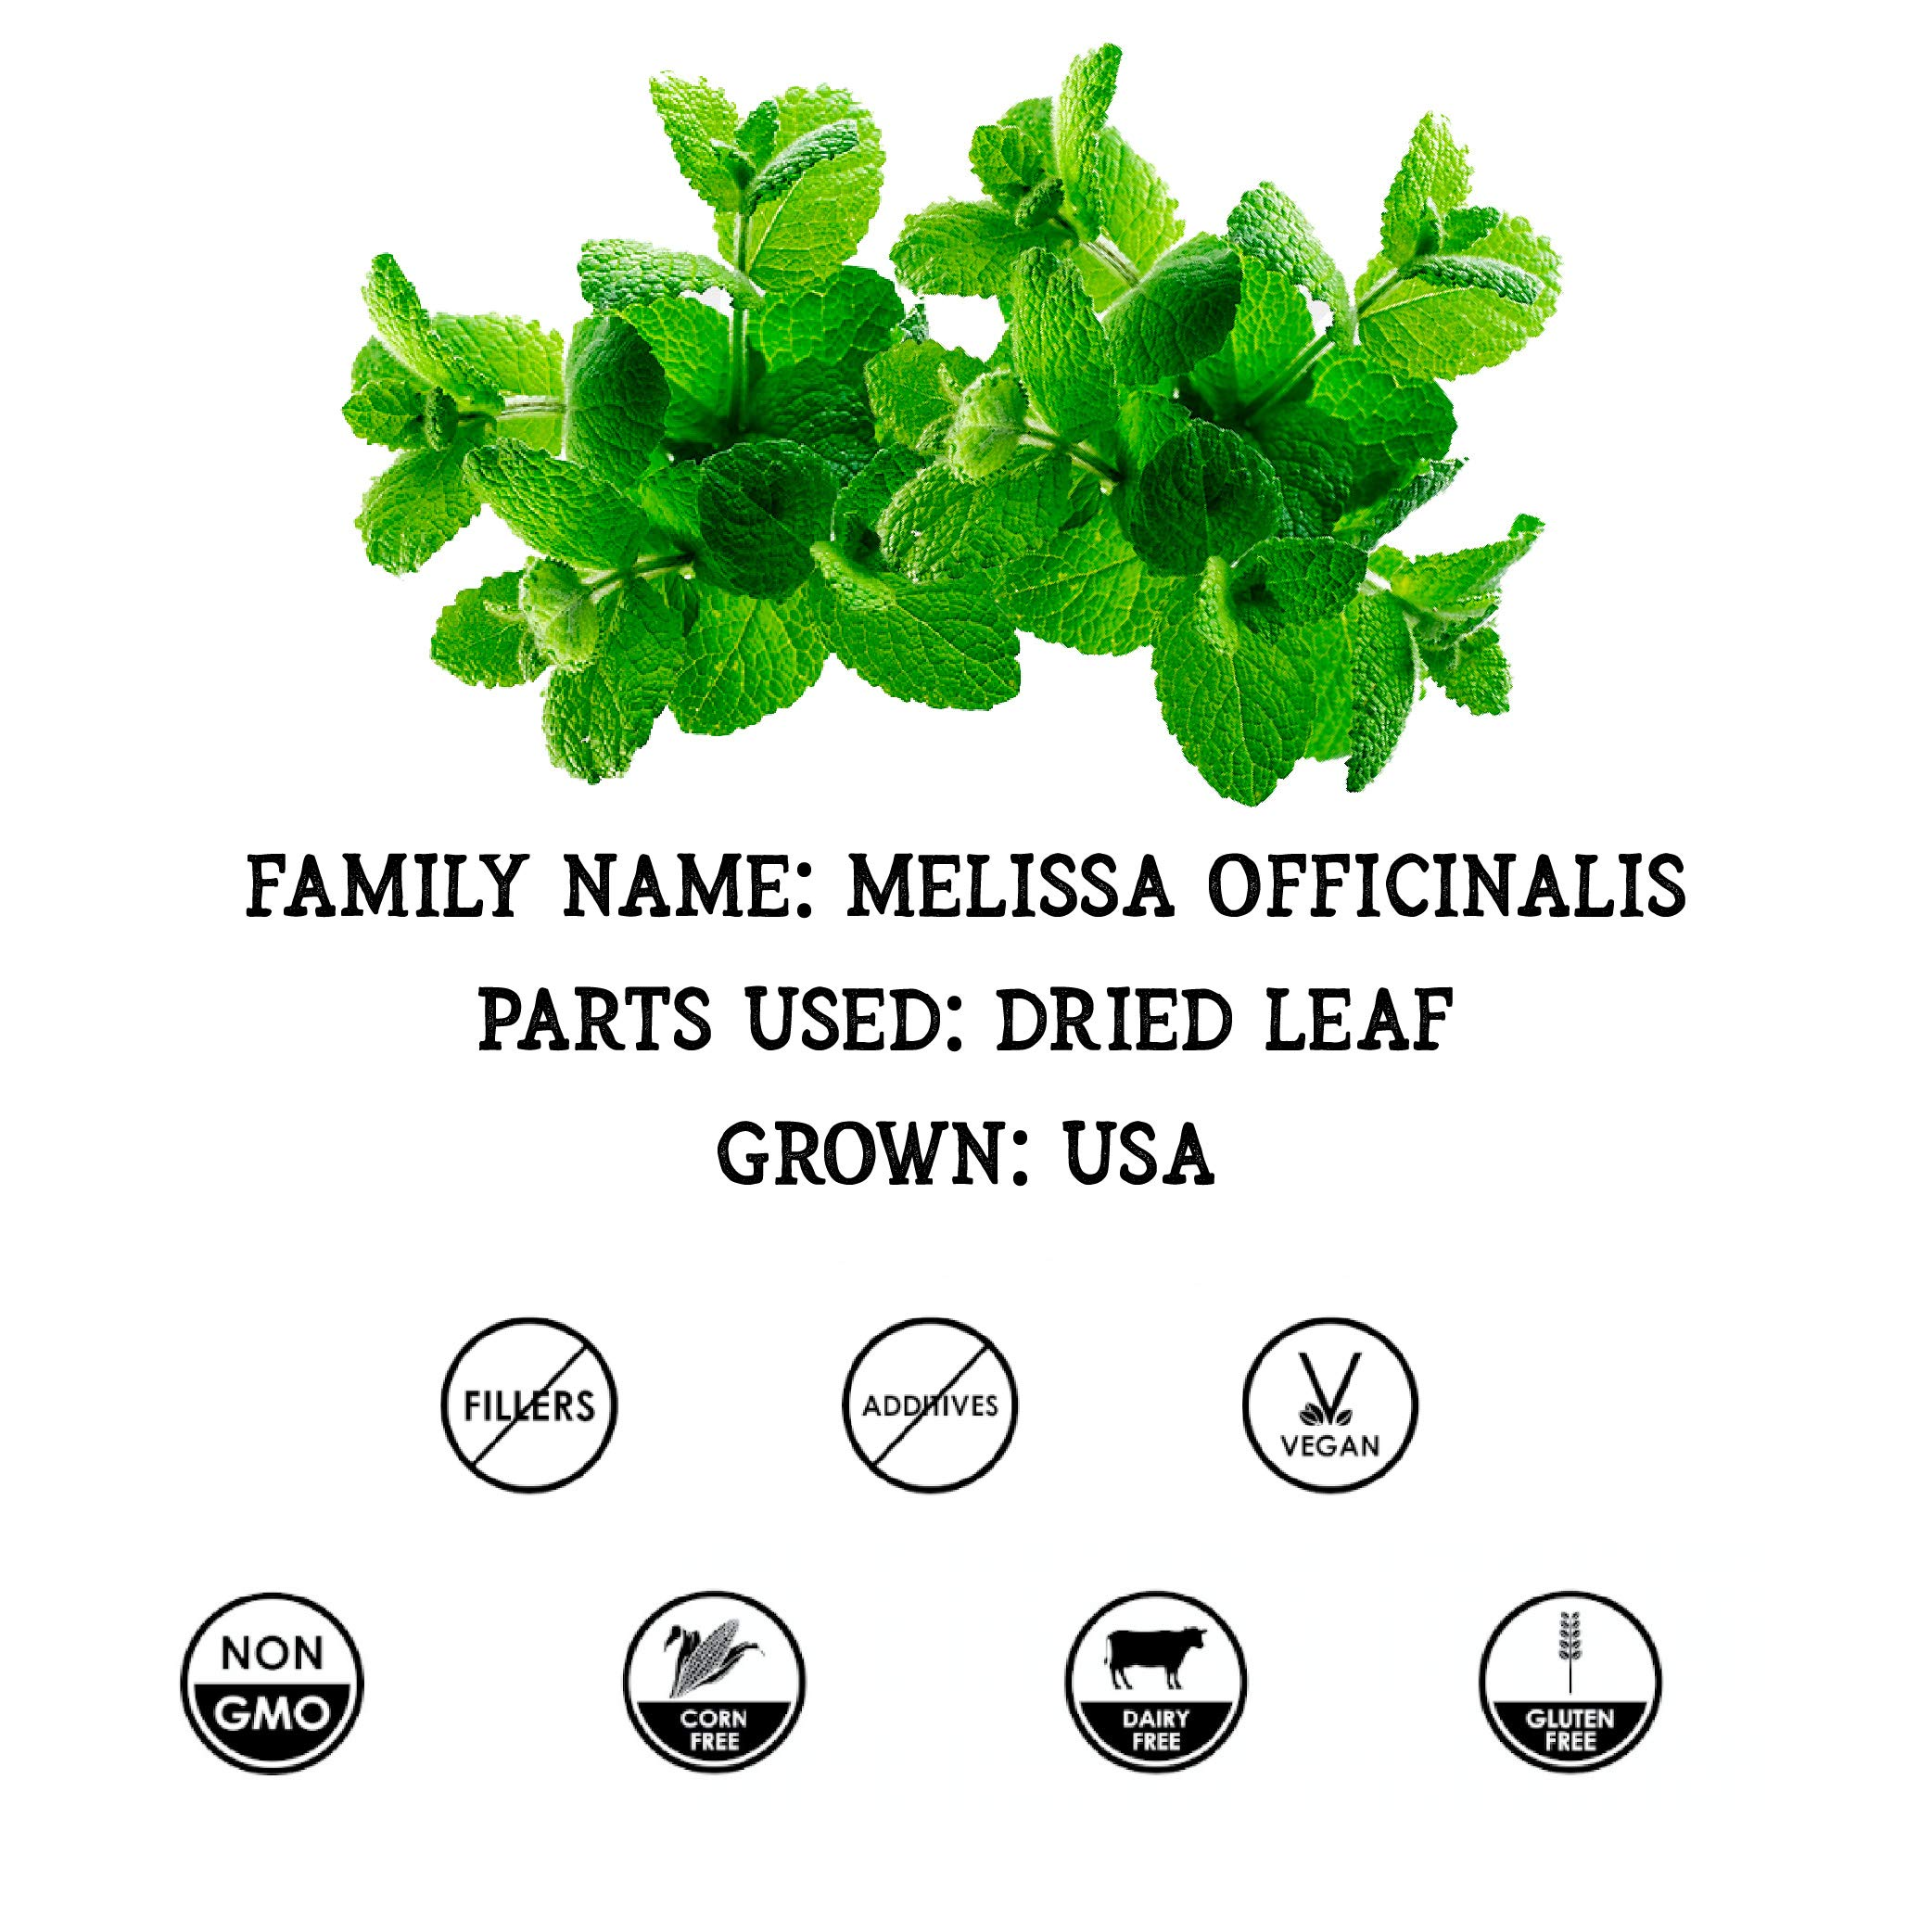 Lemon Balm Tincture, Organic Lemon Balm Extract (Melissa officinalis) Supplement: Calming, Mental Support, Anti-Viral, Anti-Anxiety 2 Oz, 670 mg by Florida Herbs (Image #3)